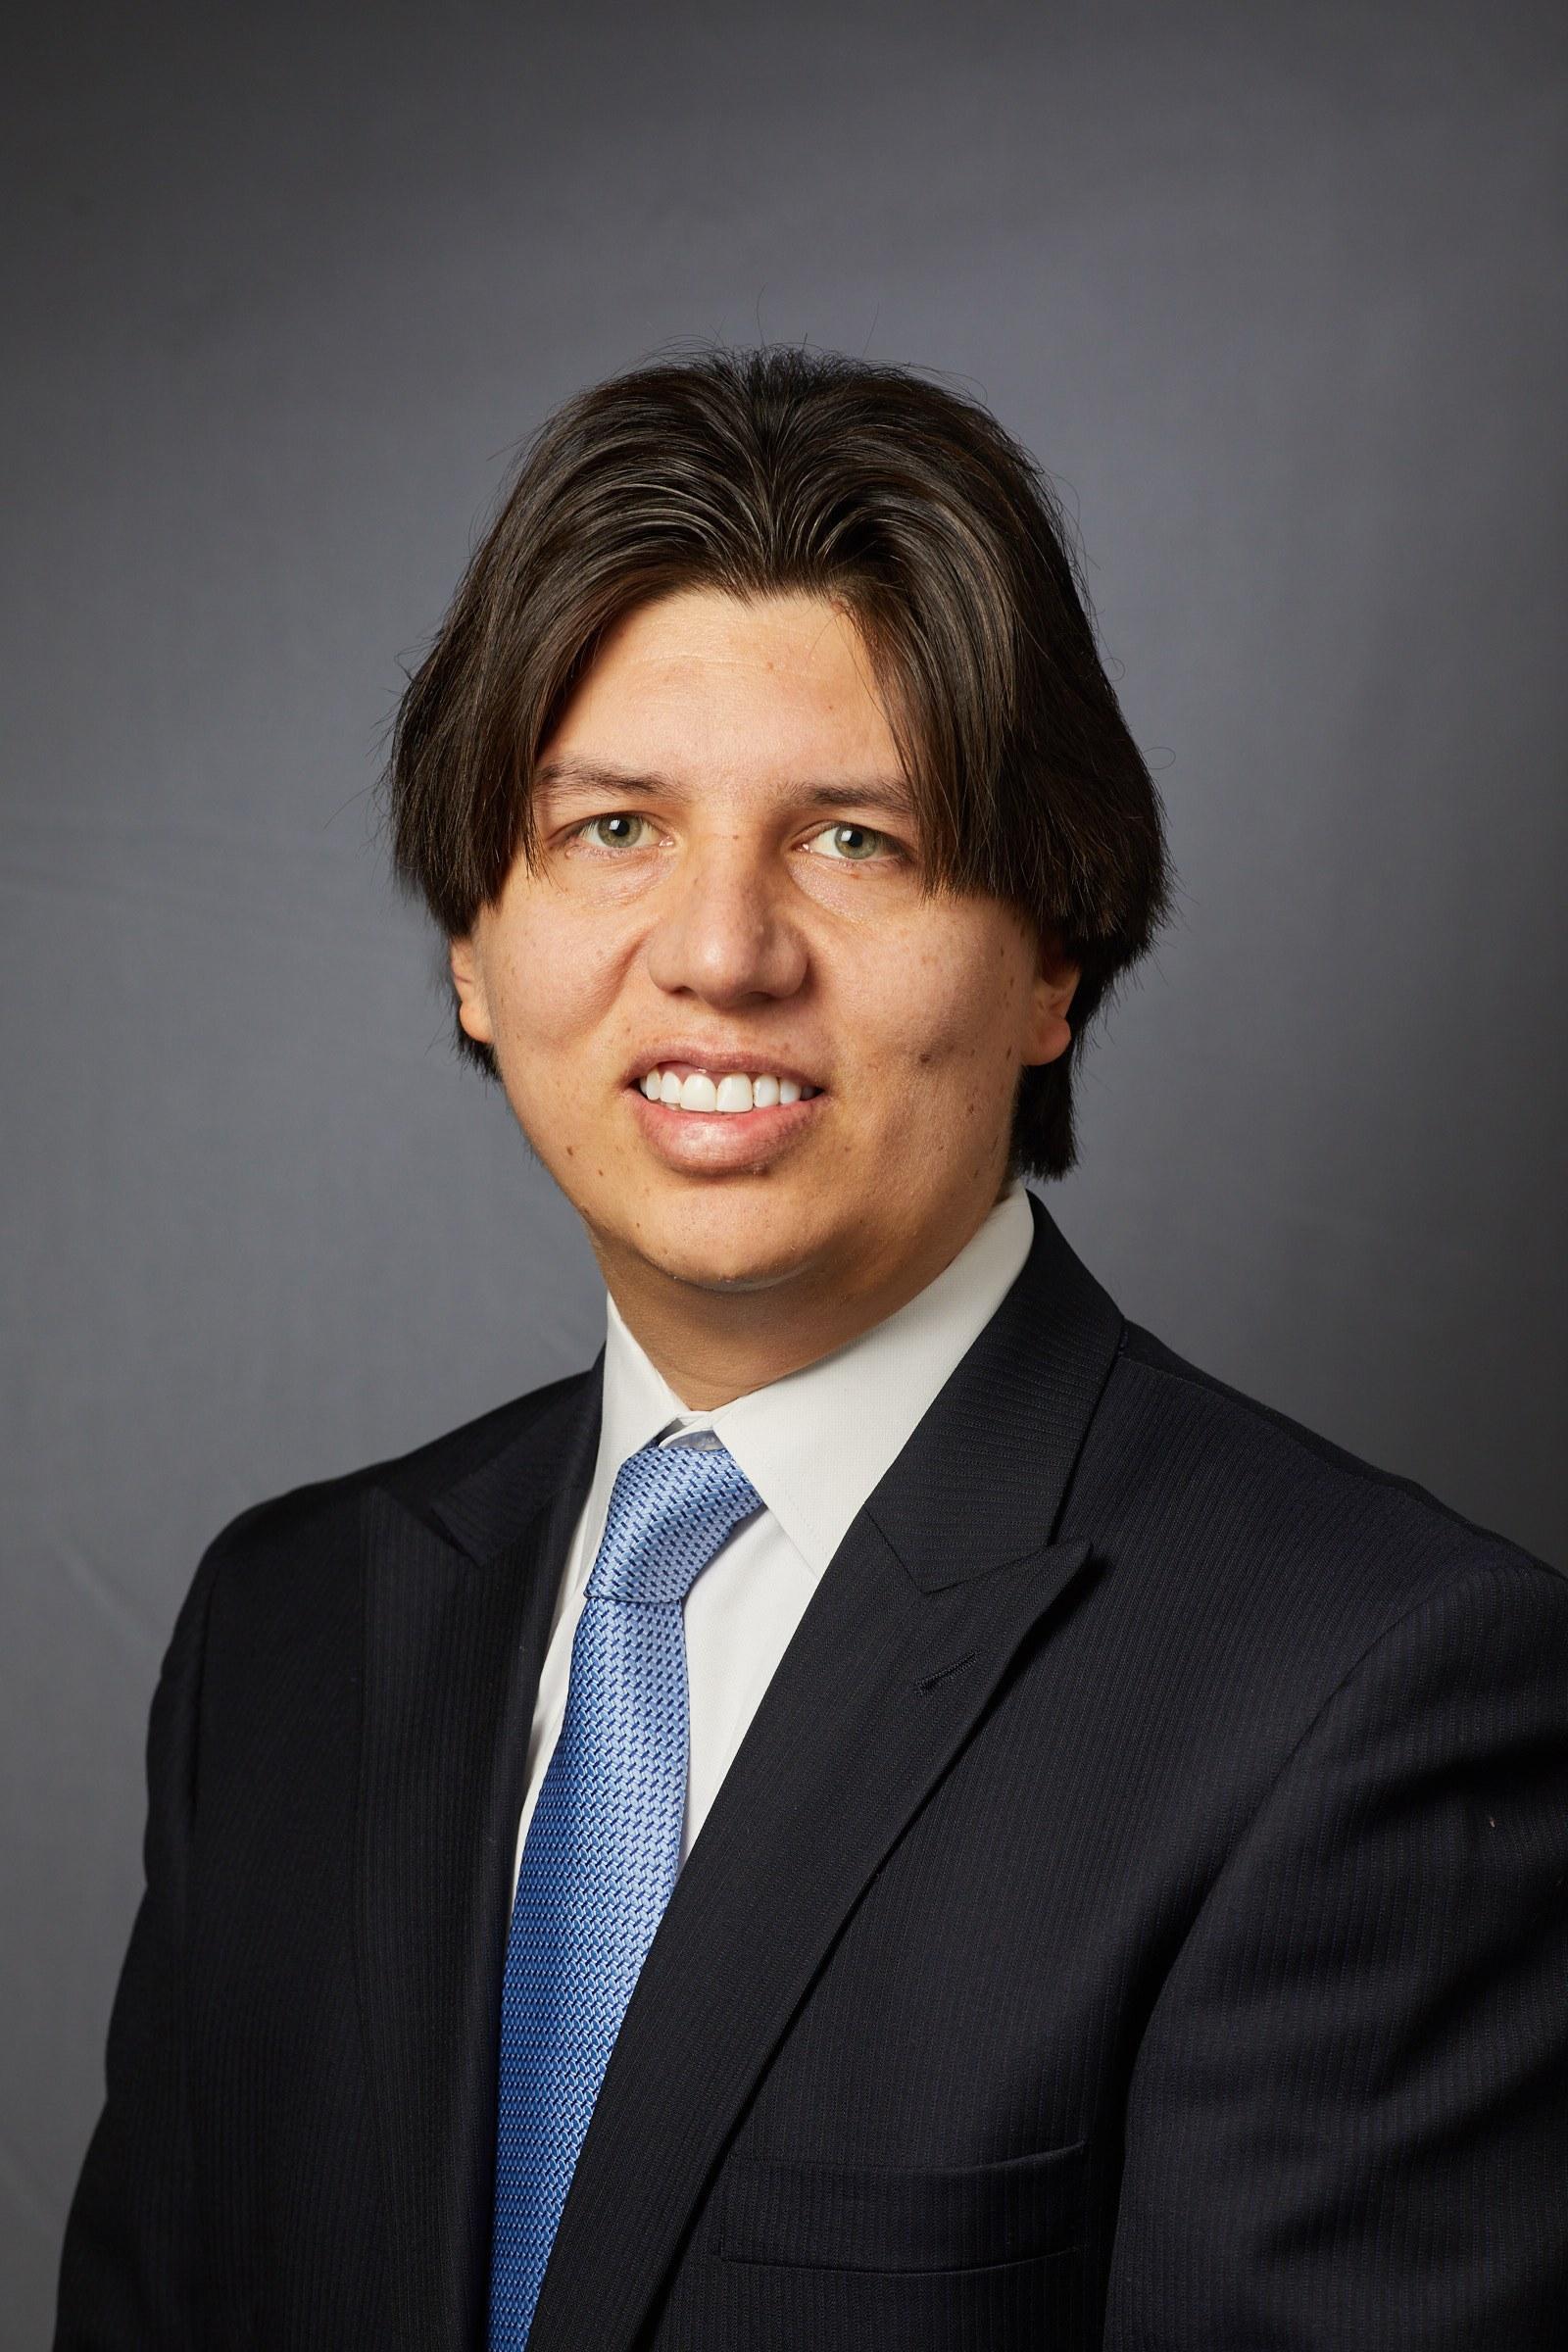 Bernardo Lombo, MD, assistant professor of clinical medicine